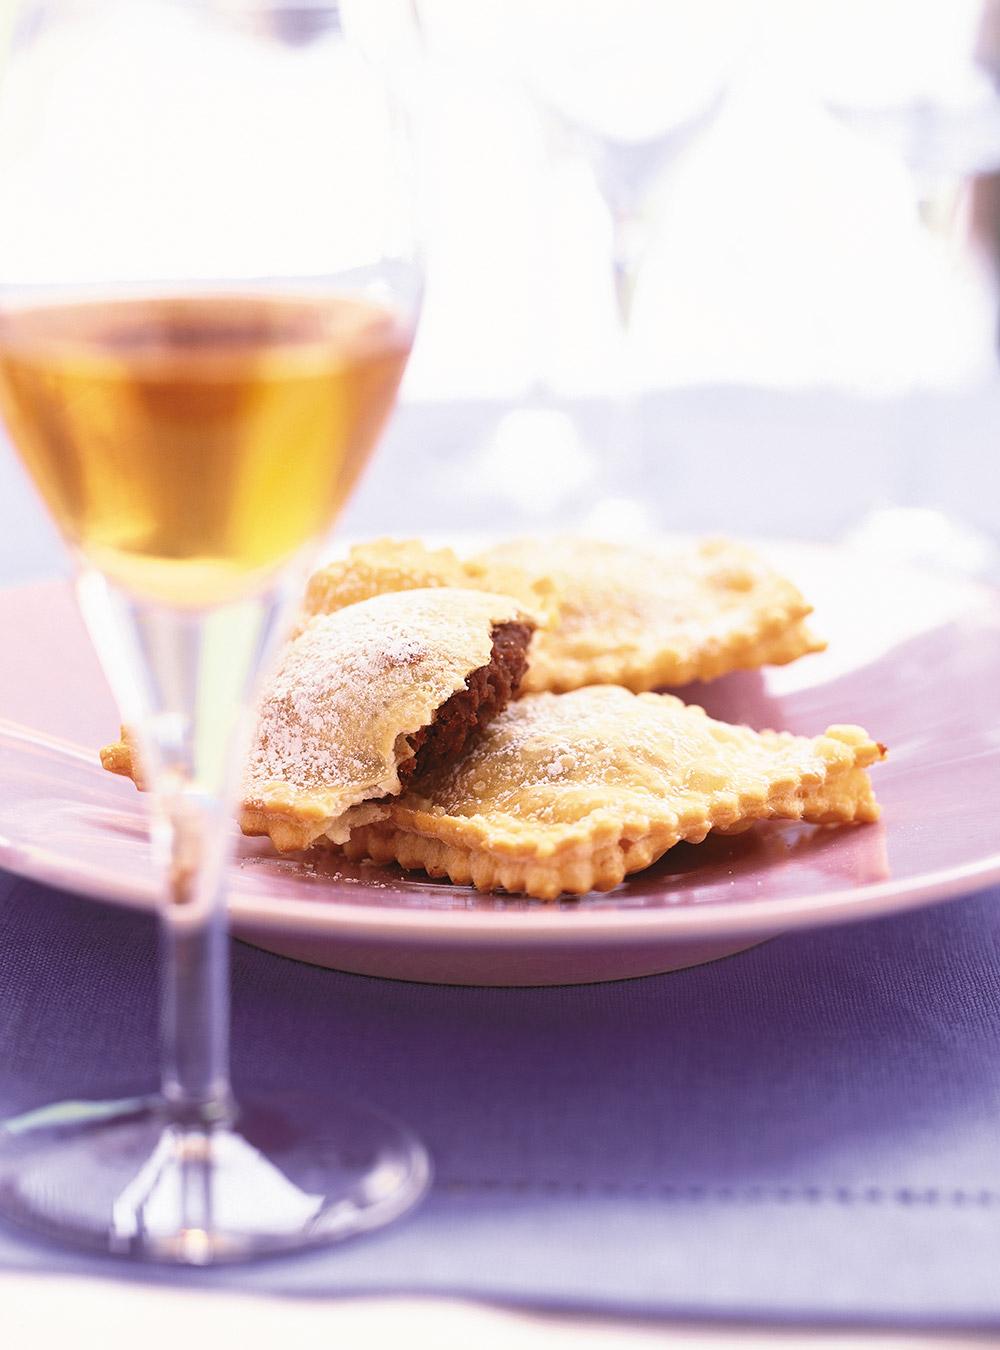 Raviolis-desserts aux marrons de verna et marina orsini | ricardo